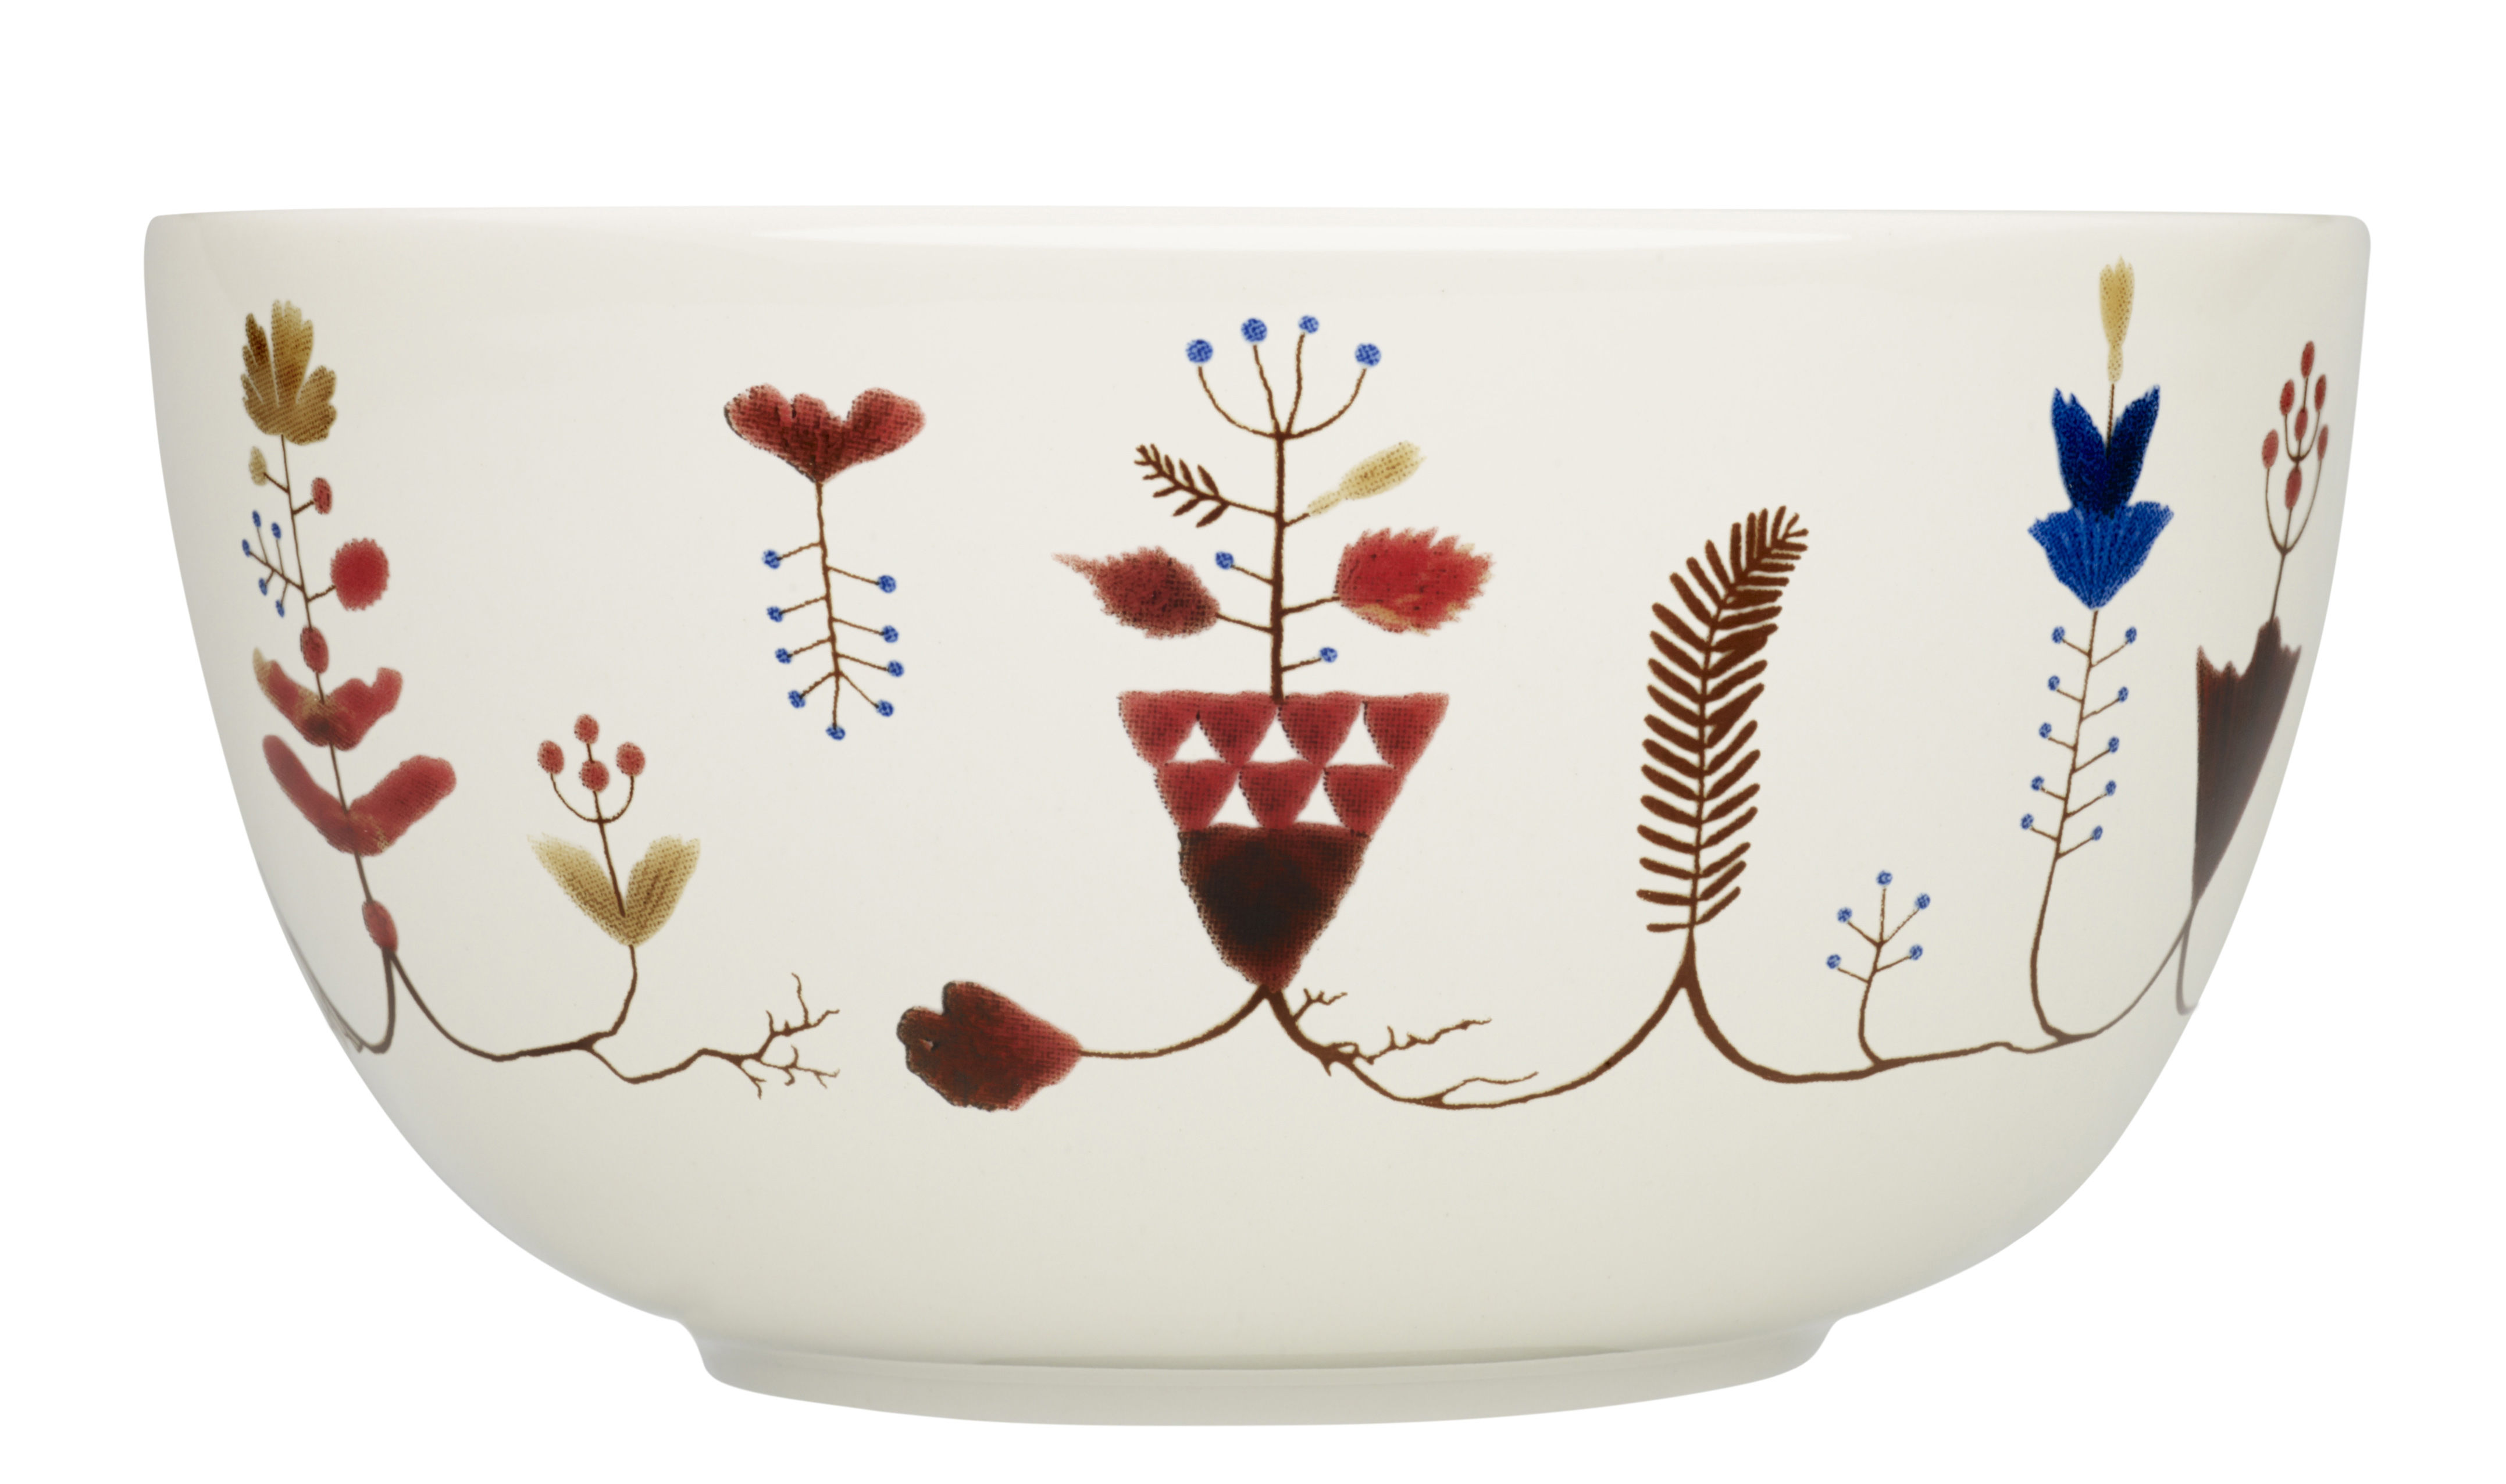 Arts de la table - Saladiers, coupes et bols - Bol Varpu / 33 cl - Iittala - Blanc / Motifs multicolores - Céramique